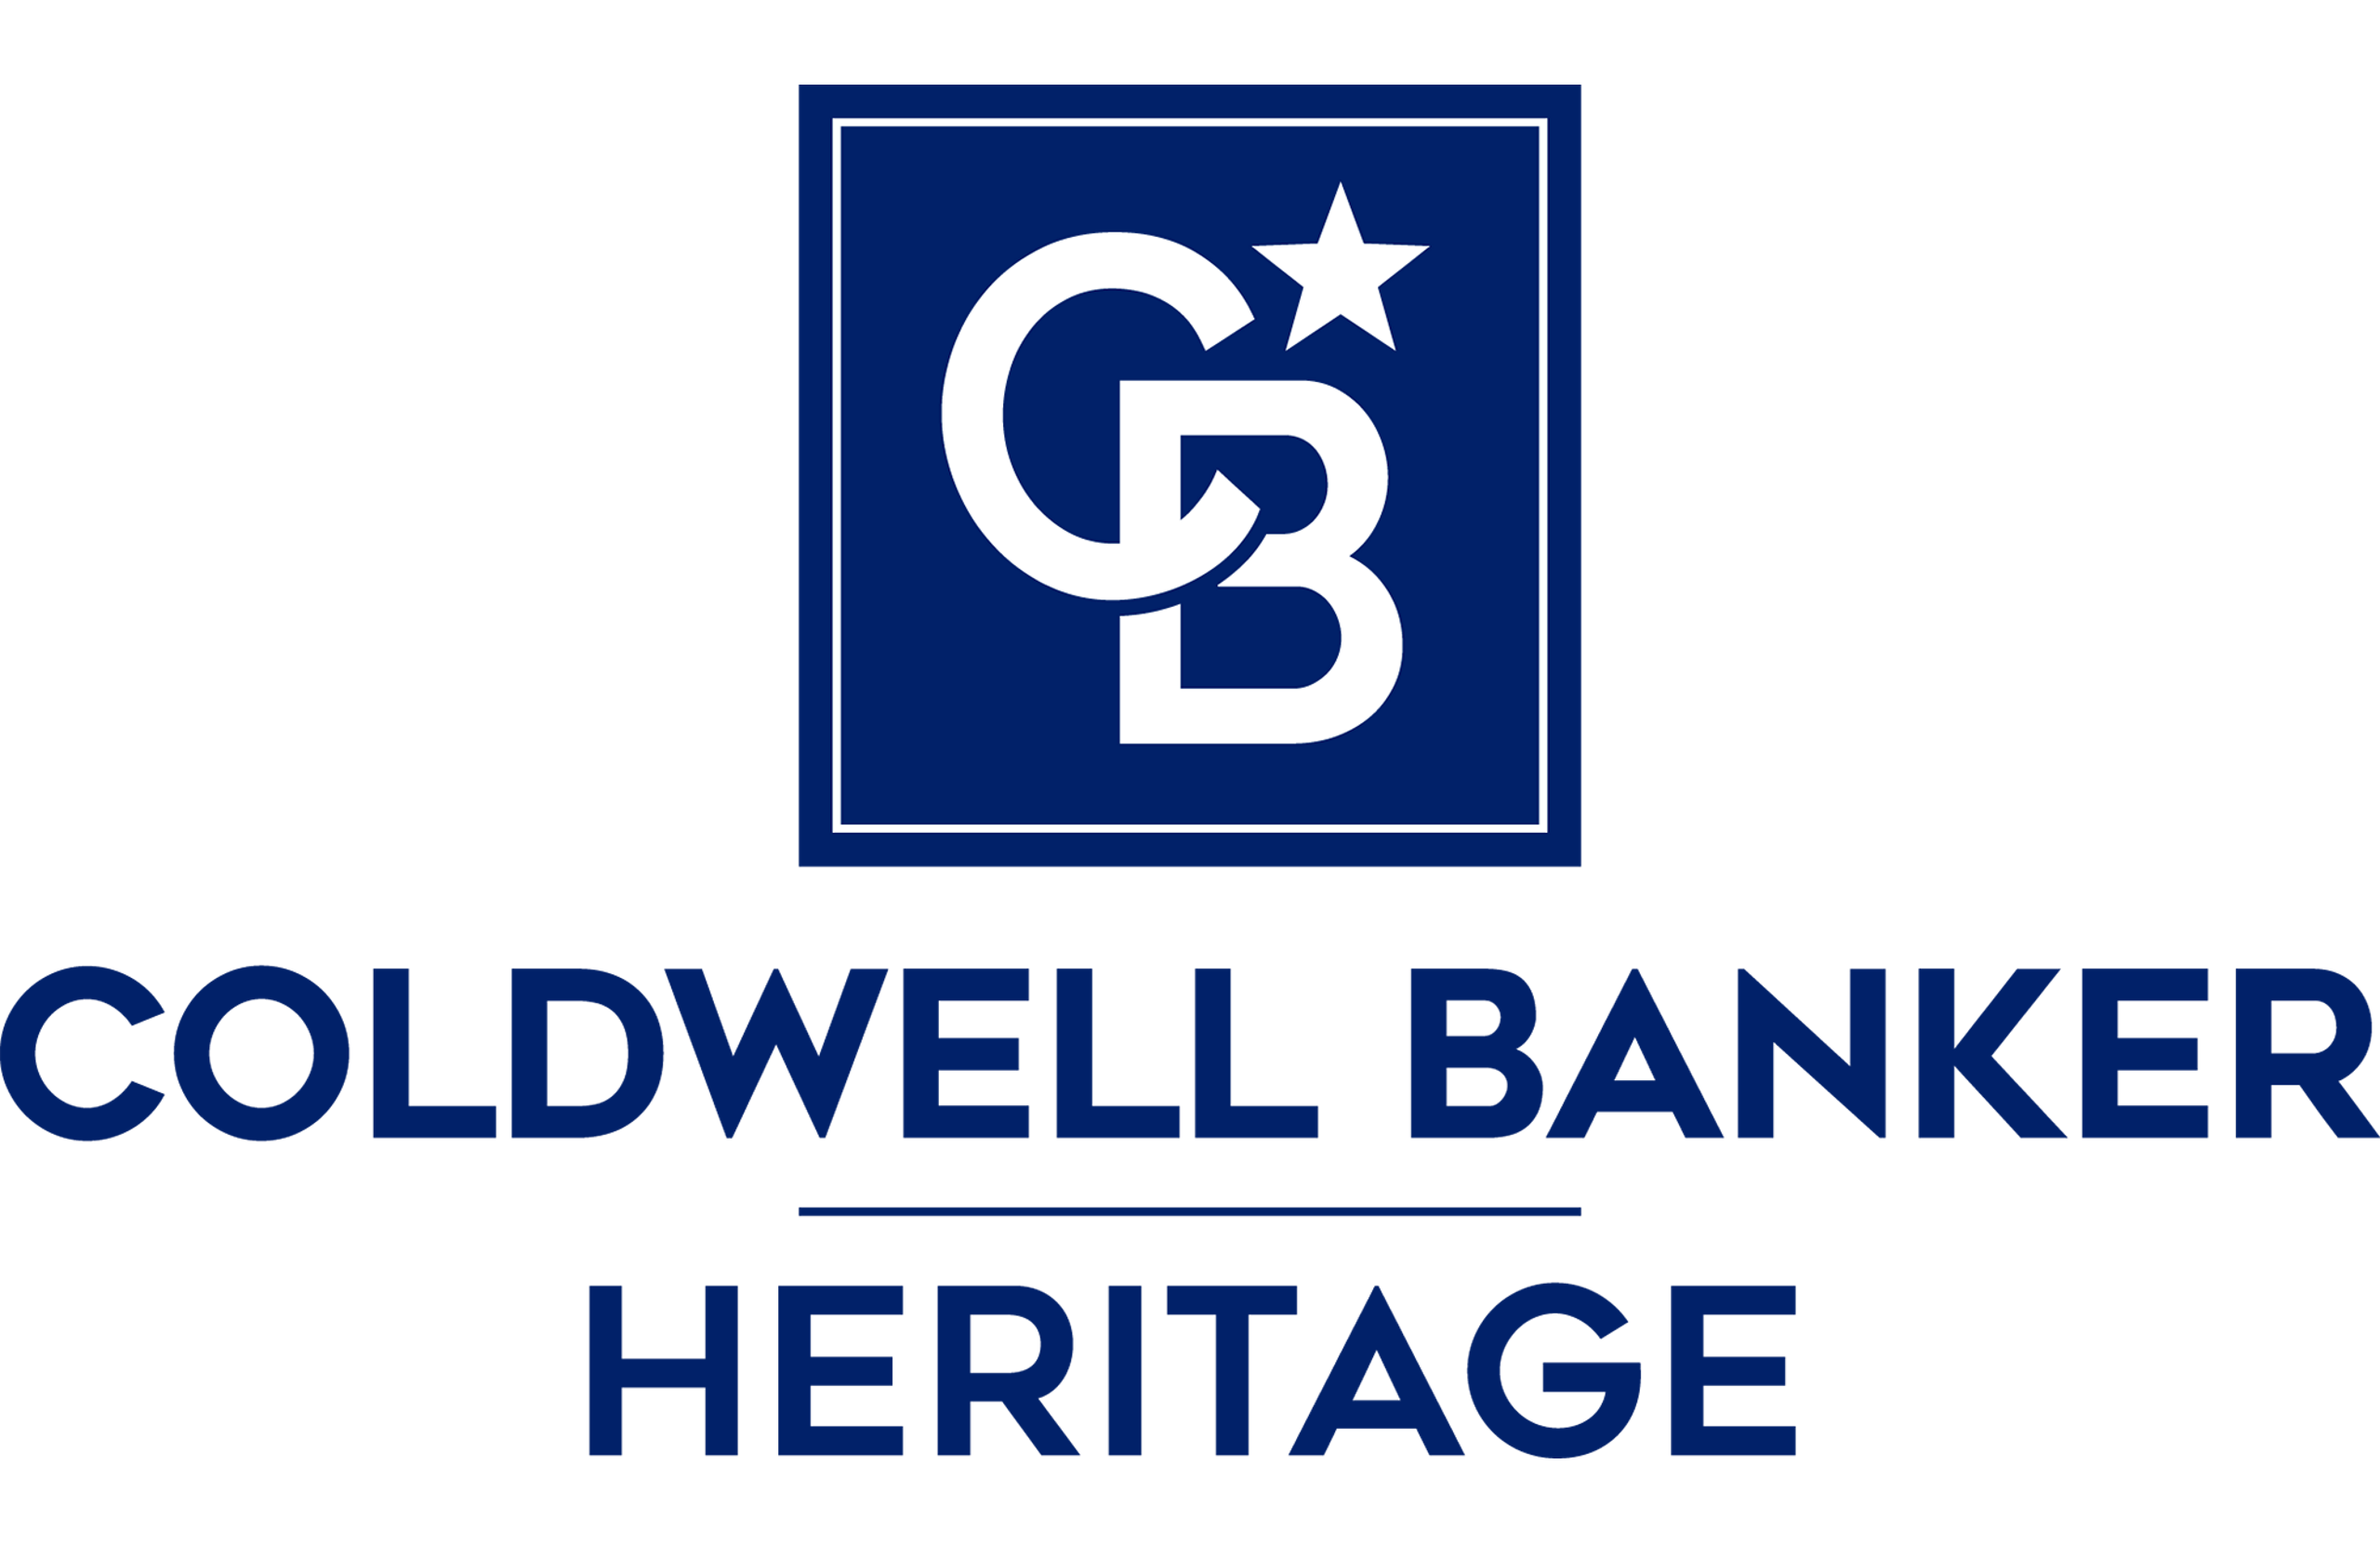 Linda Leesman - Coldwell Banker Heritage Logo